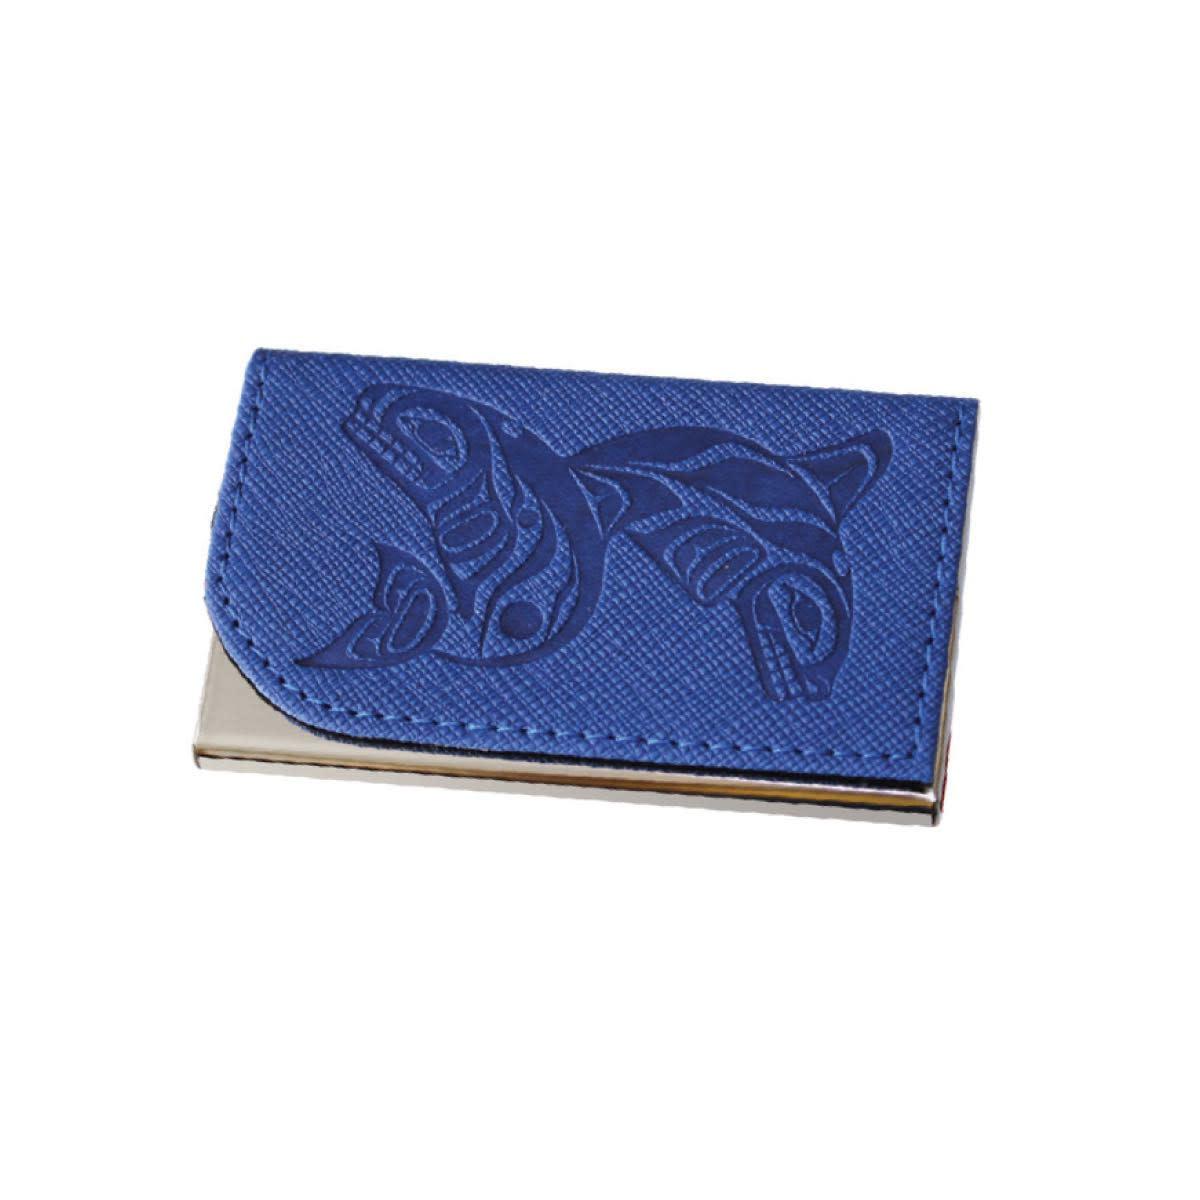 Business Card Holder-7